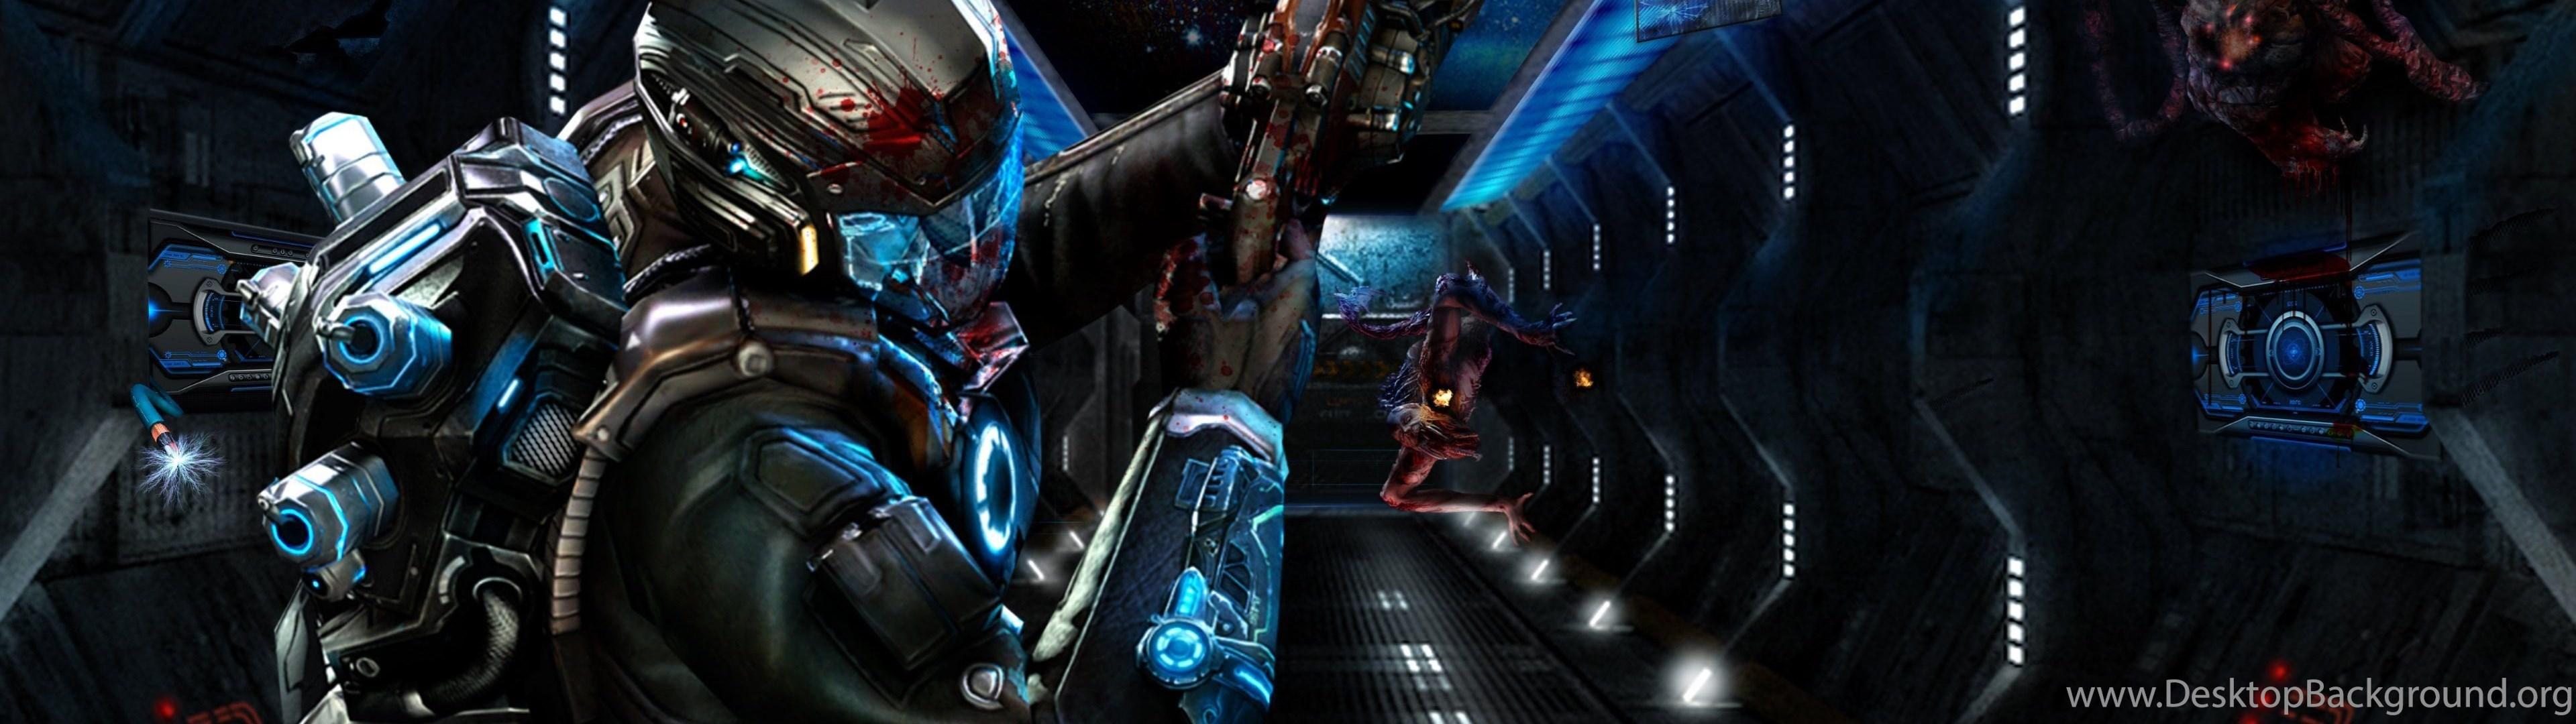 Download 4k Gaming Wallpapers Desktop Backgrounds Desktop